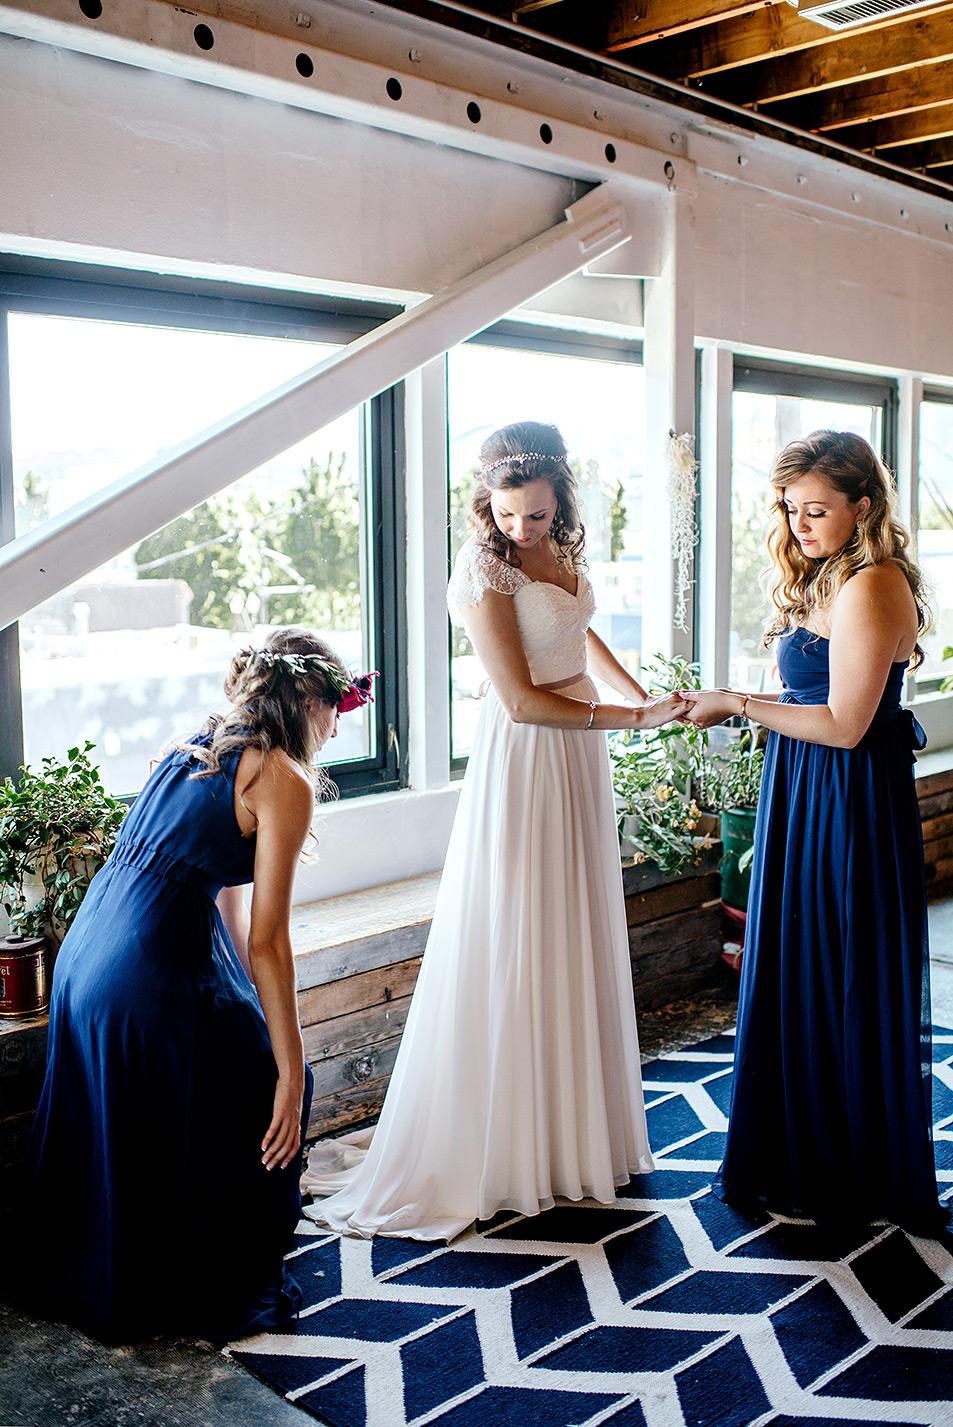 union-pine-the-loft-wedding16.jpeg